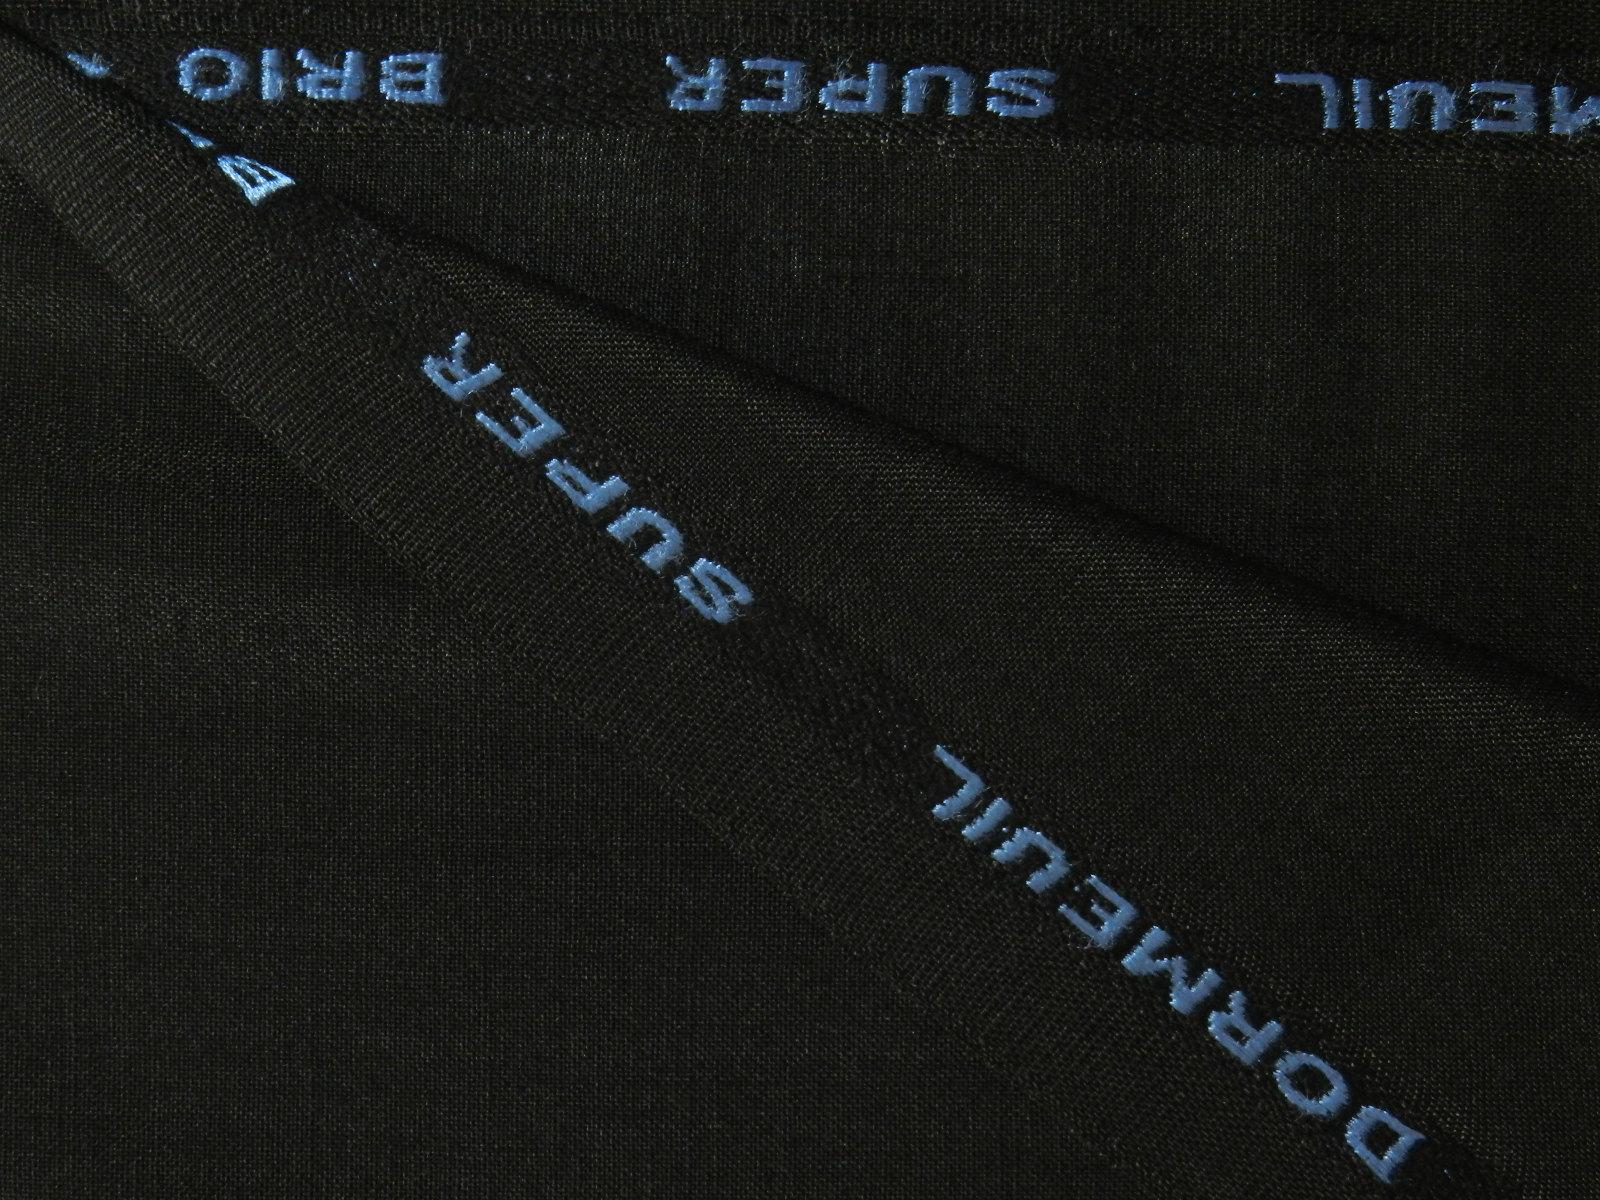 DORMEUIL(ドーメル) / SUPER BRIO / ENGLAND / モヘア / ブラック 系 / 織り柄 系